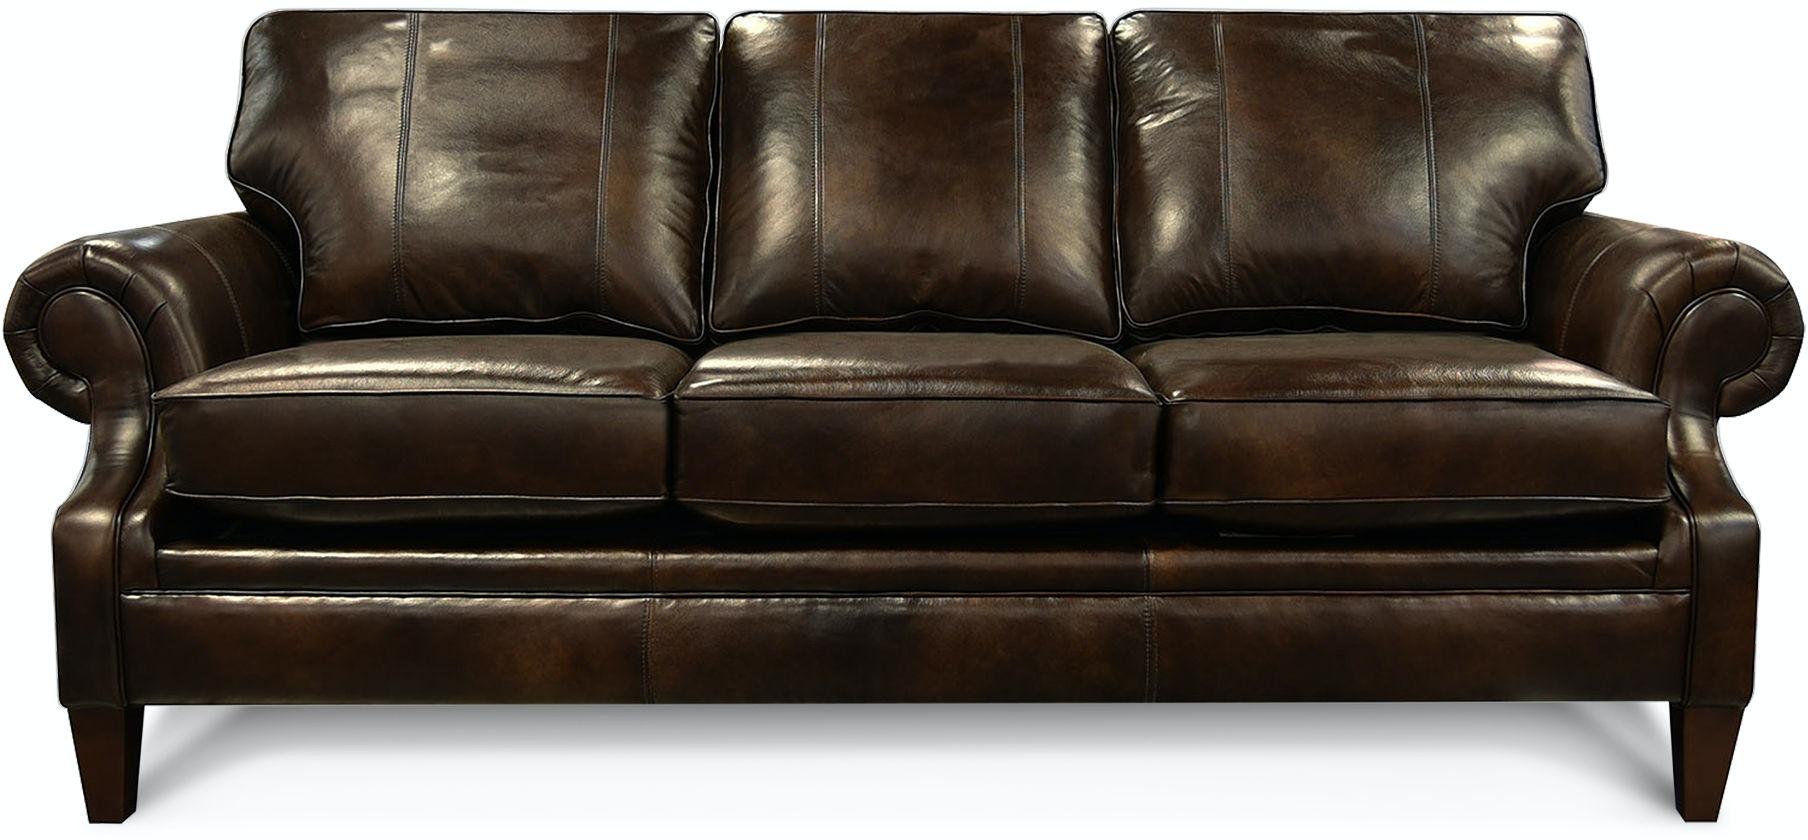 England Living Room Boone Sofa 3x05al Seaside Furniture